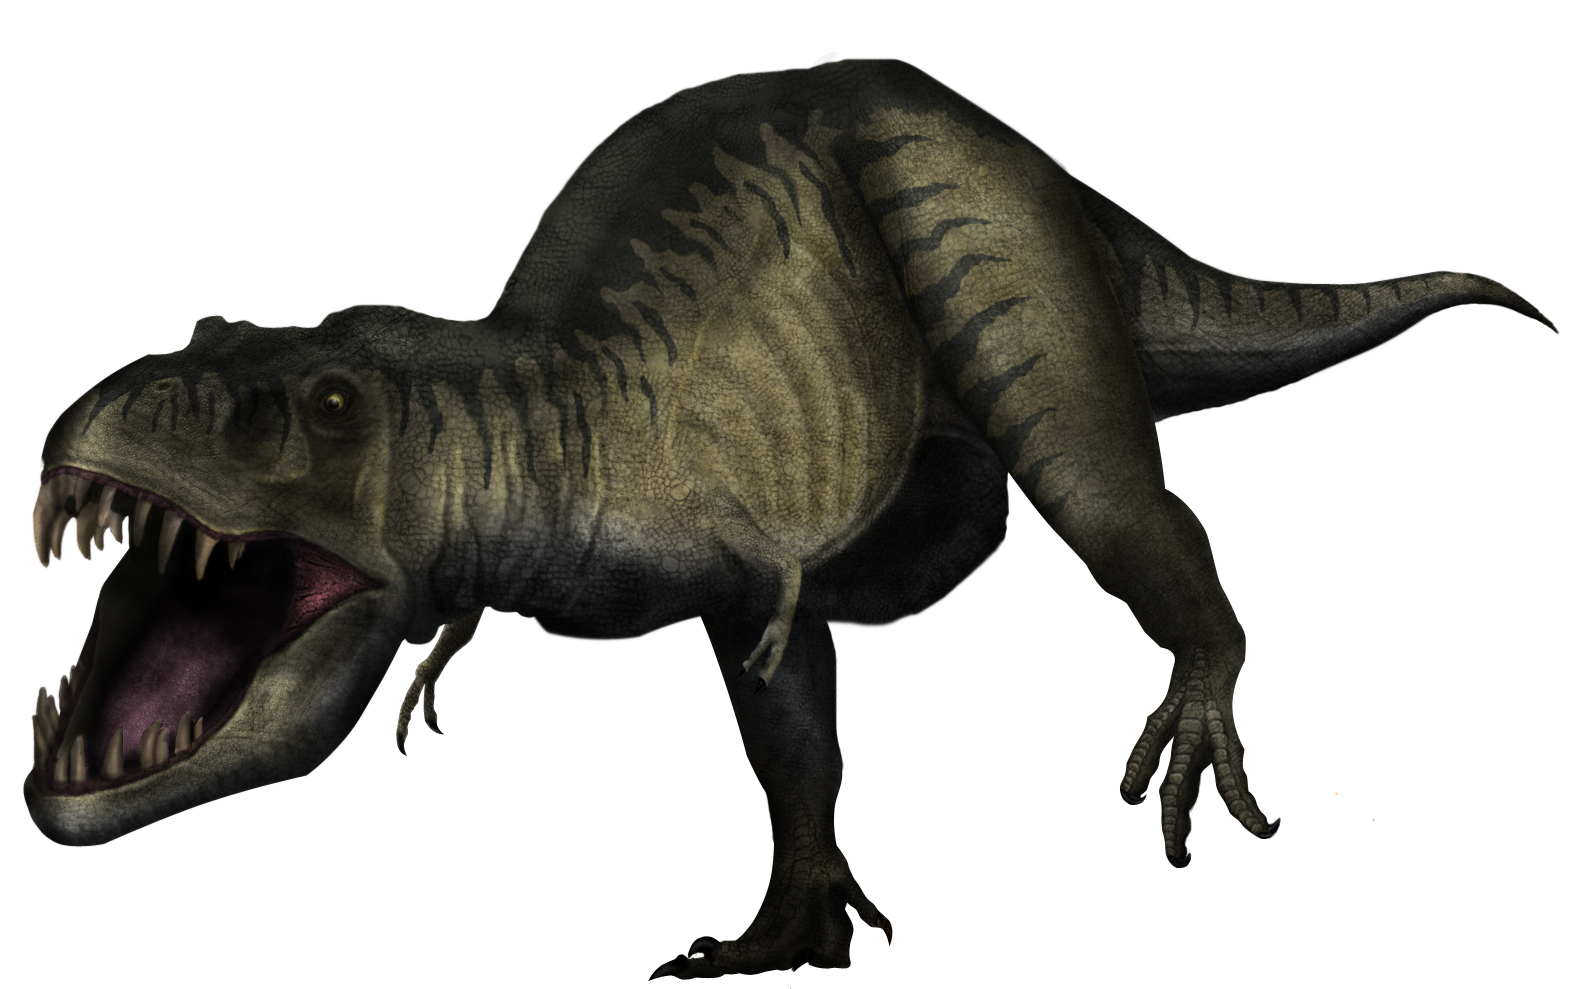 Tyrannosaurus rex by rick-raptor